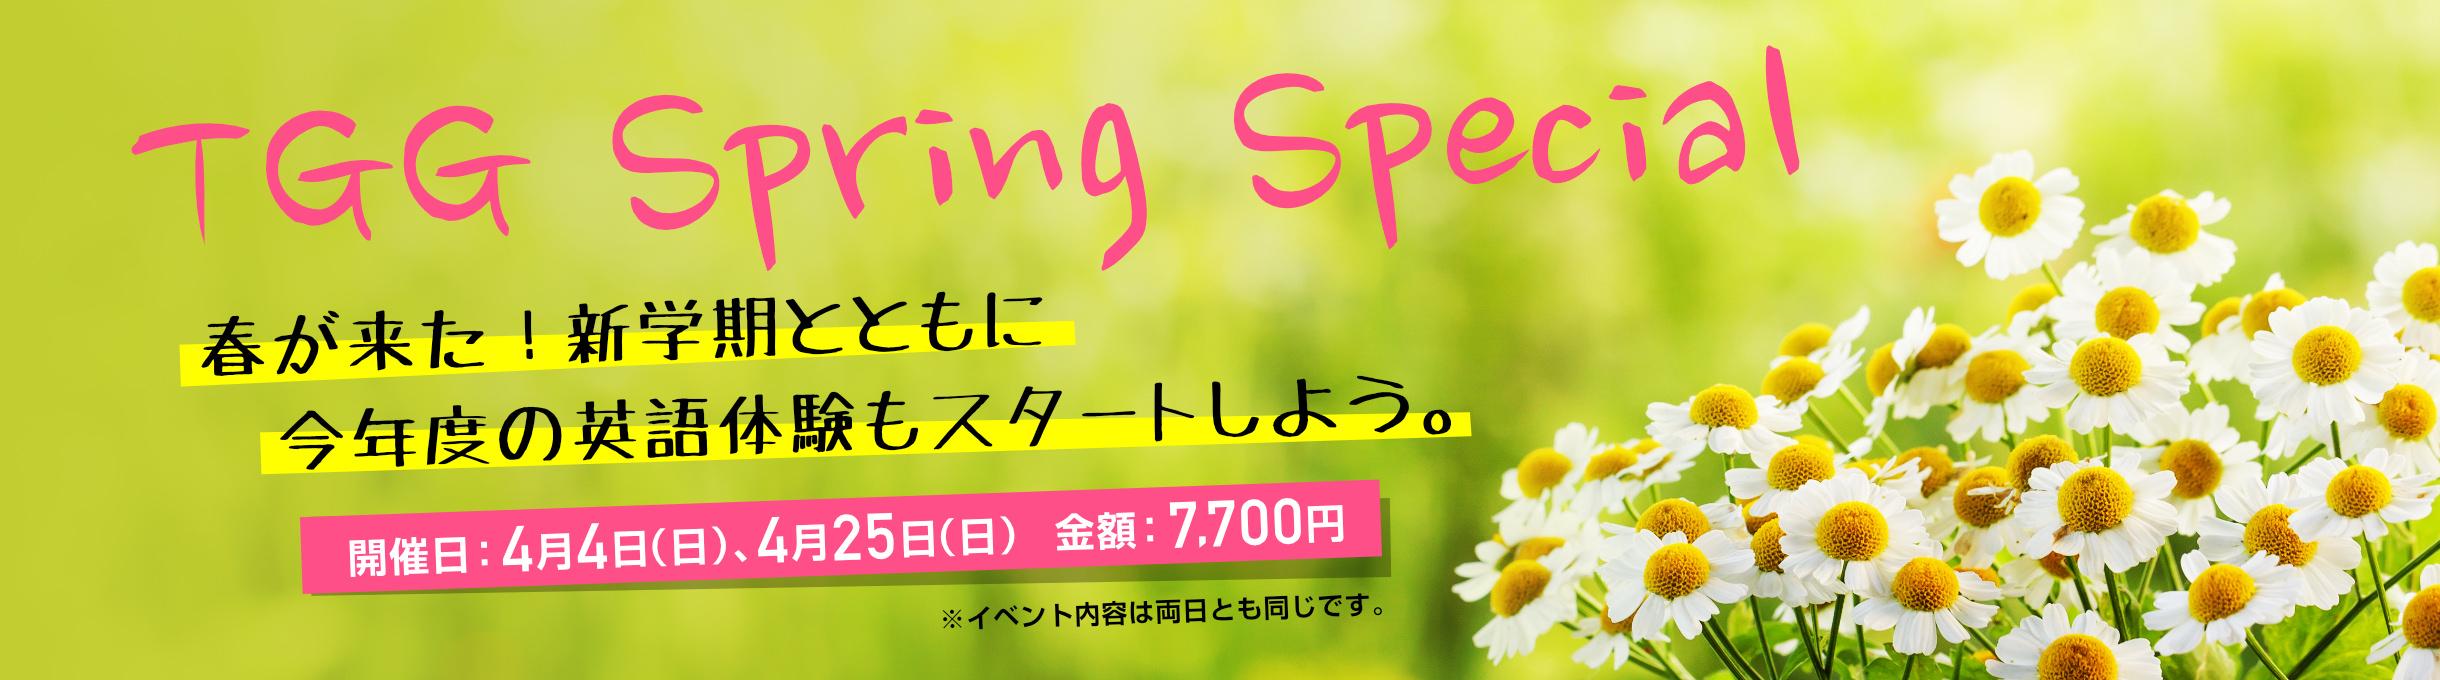 TGG Spring Special